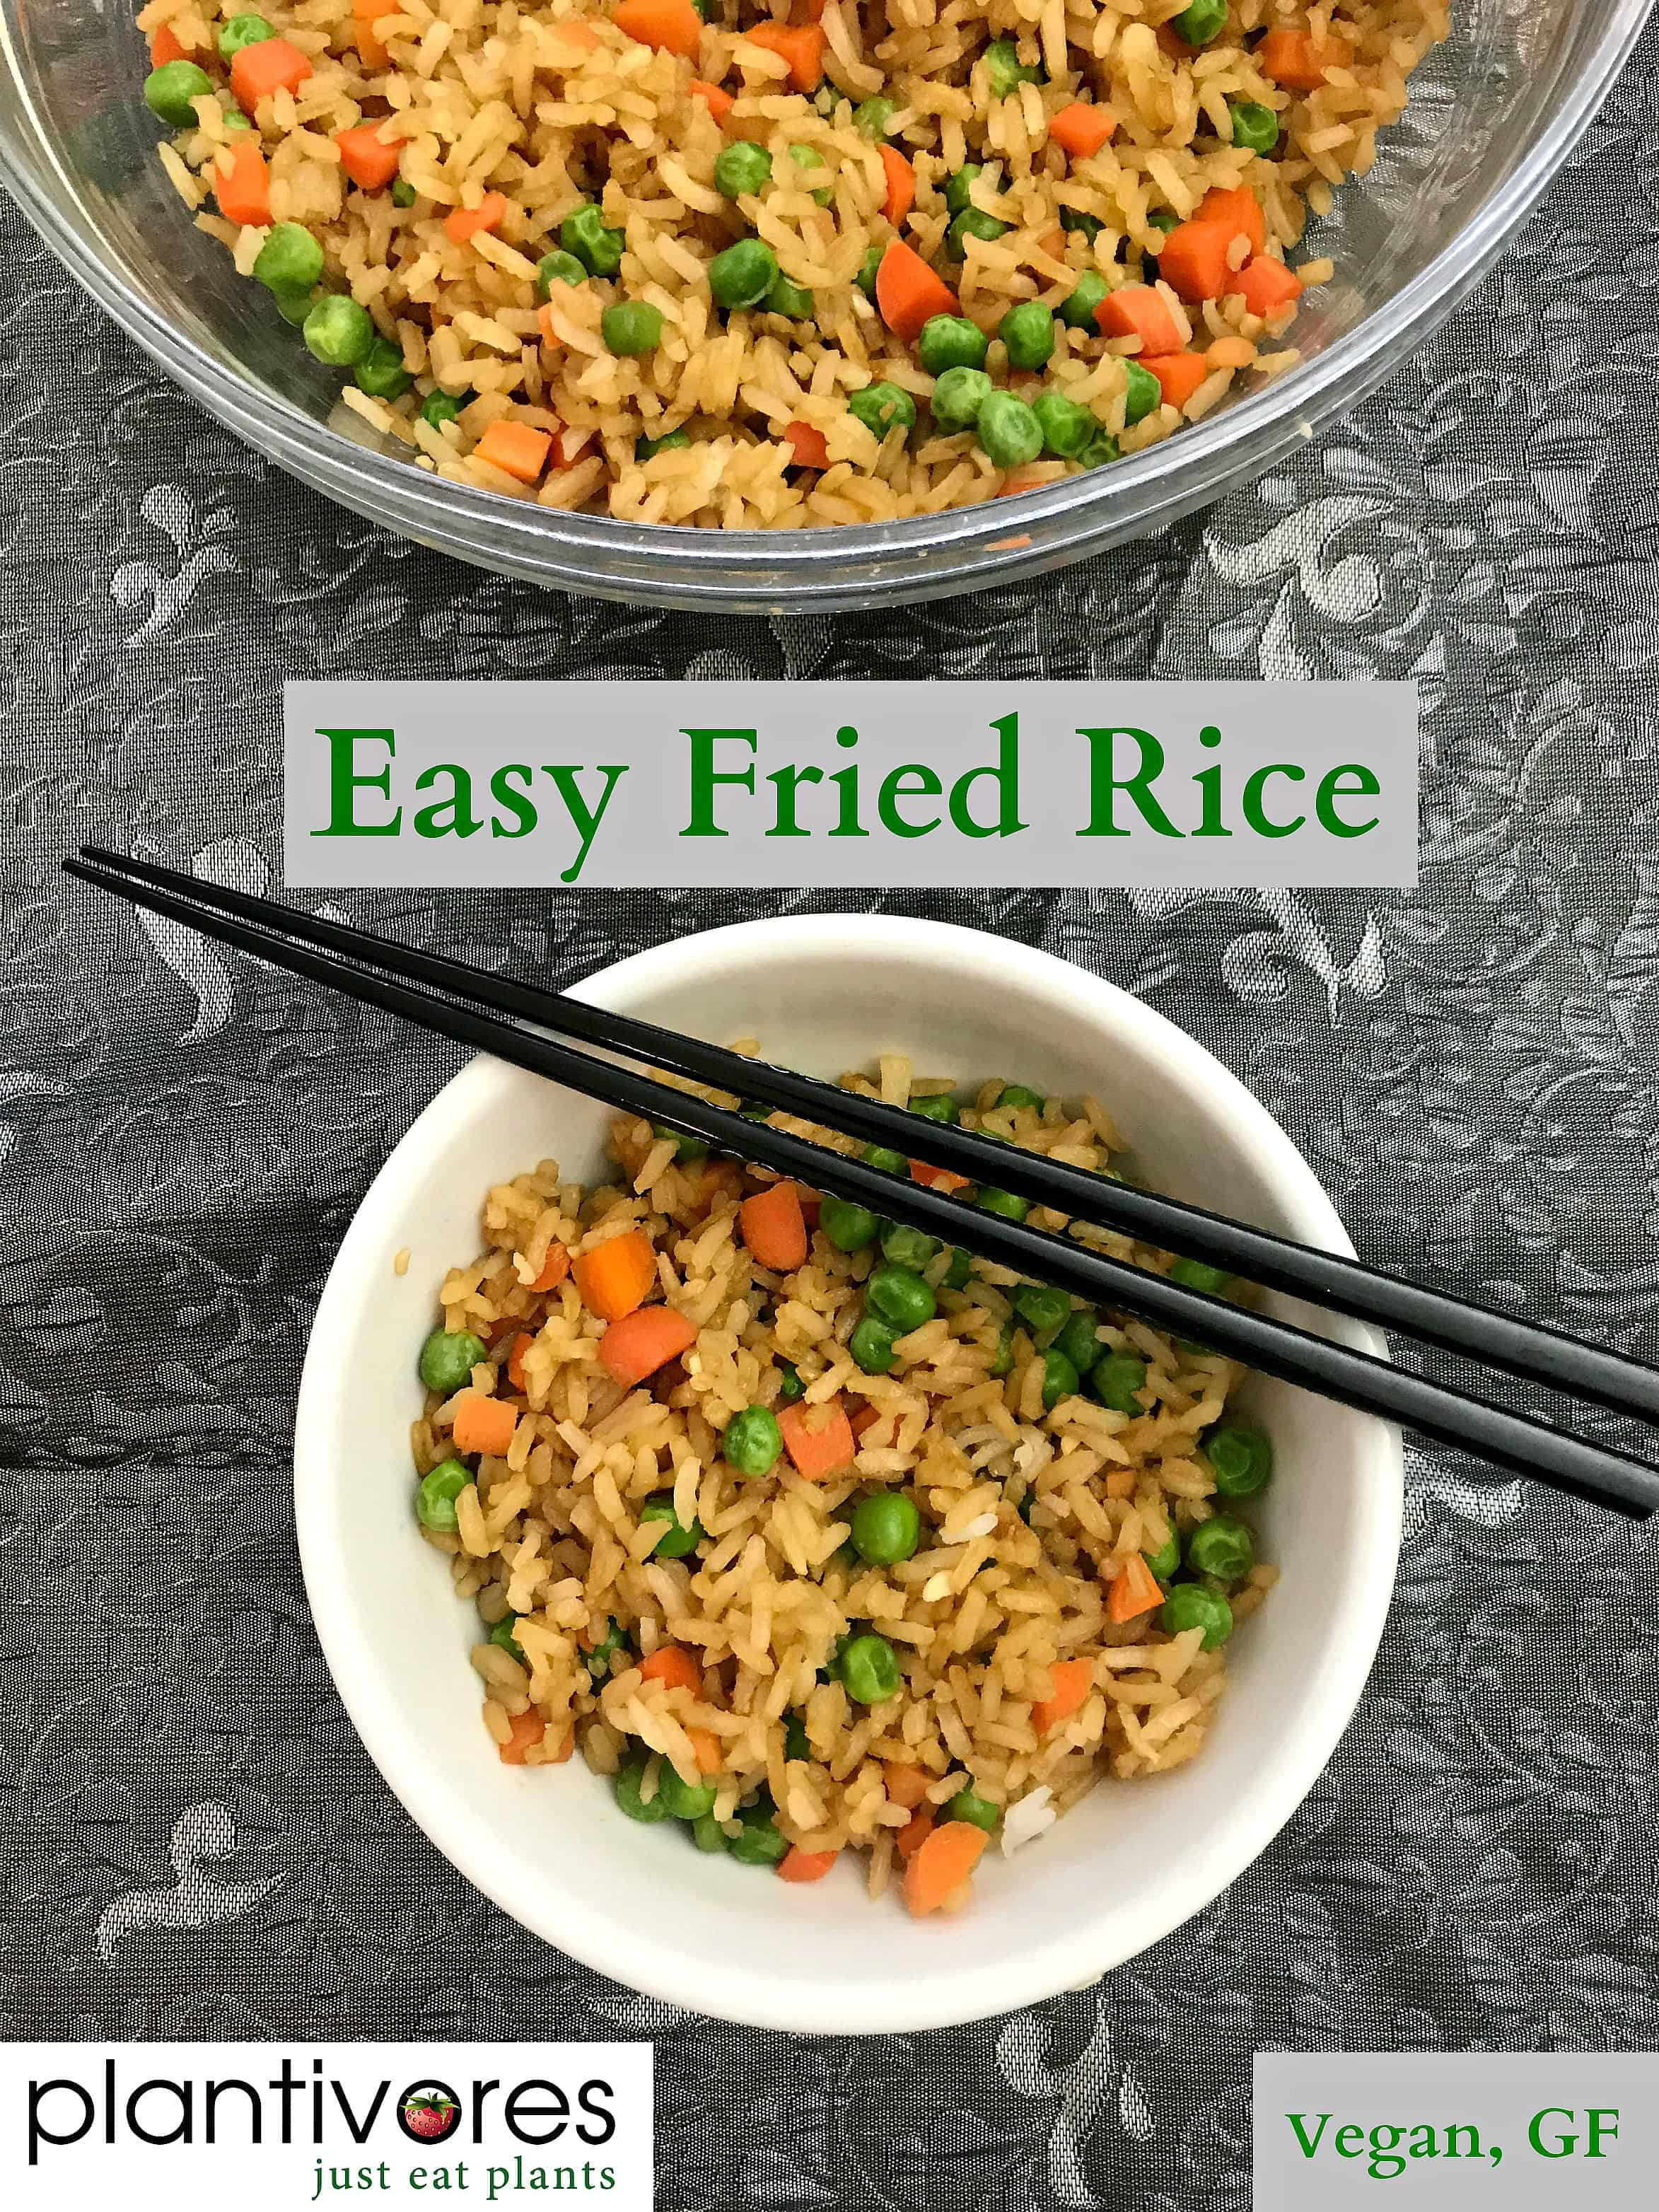 Easy fried rice vegan gf plantivores easy fried rice vegan gf ccuart Choice Image